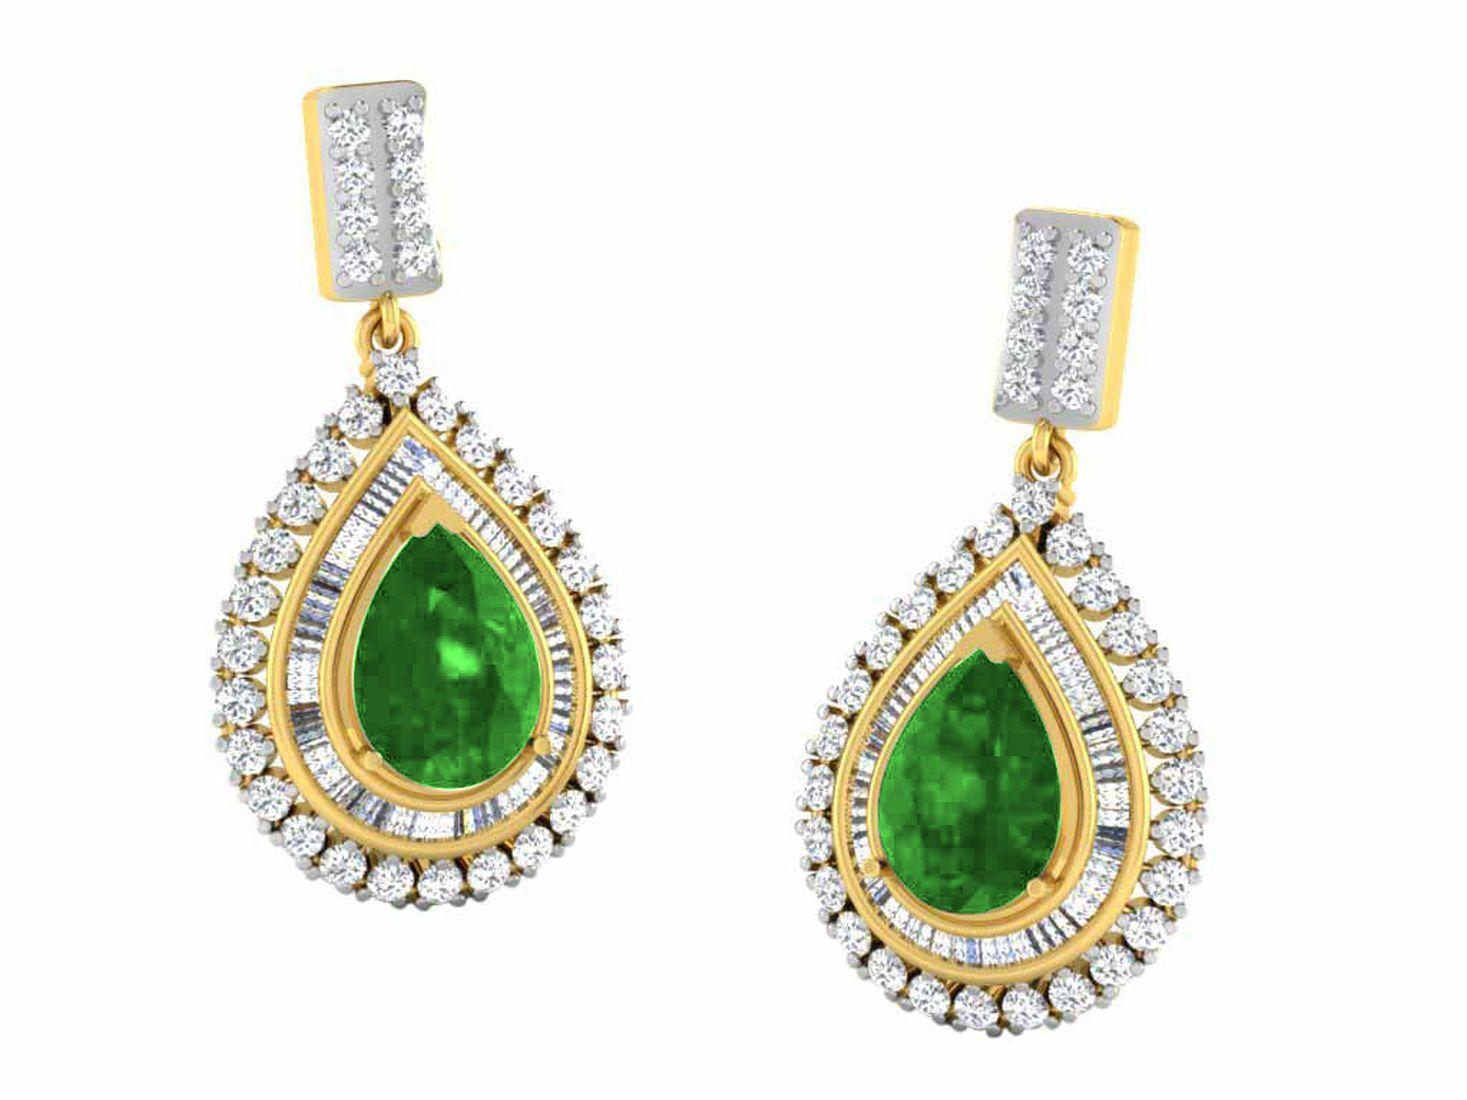 His & Her 9k Yellow Gold Emerald Drop Earrings